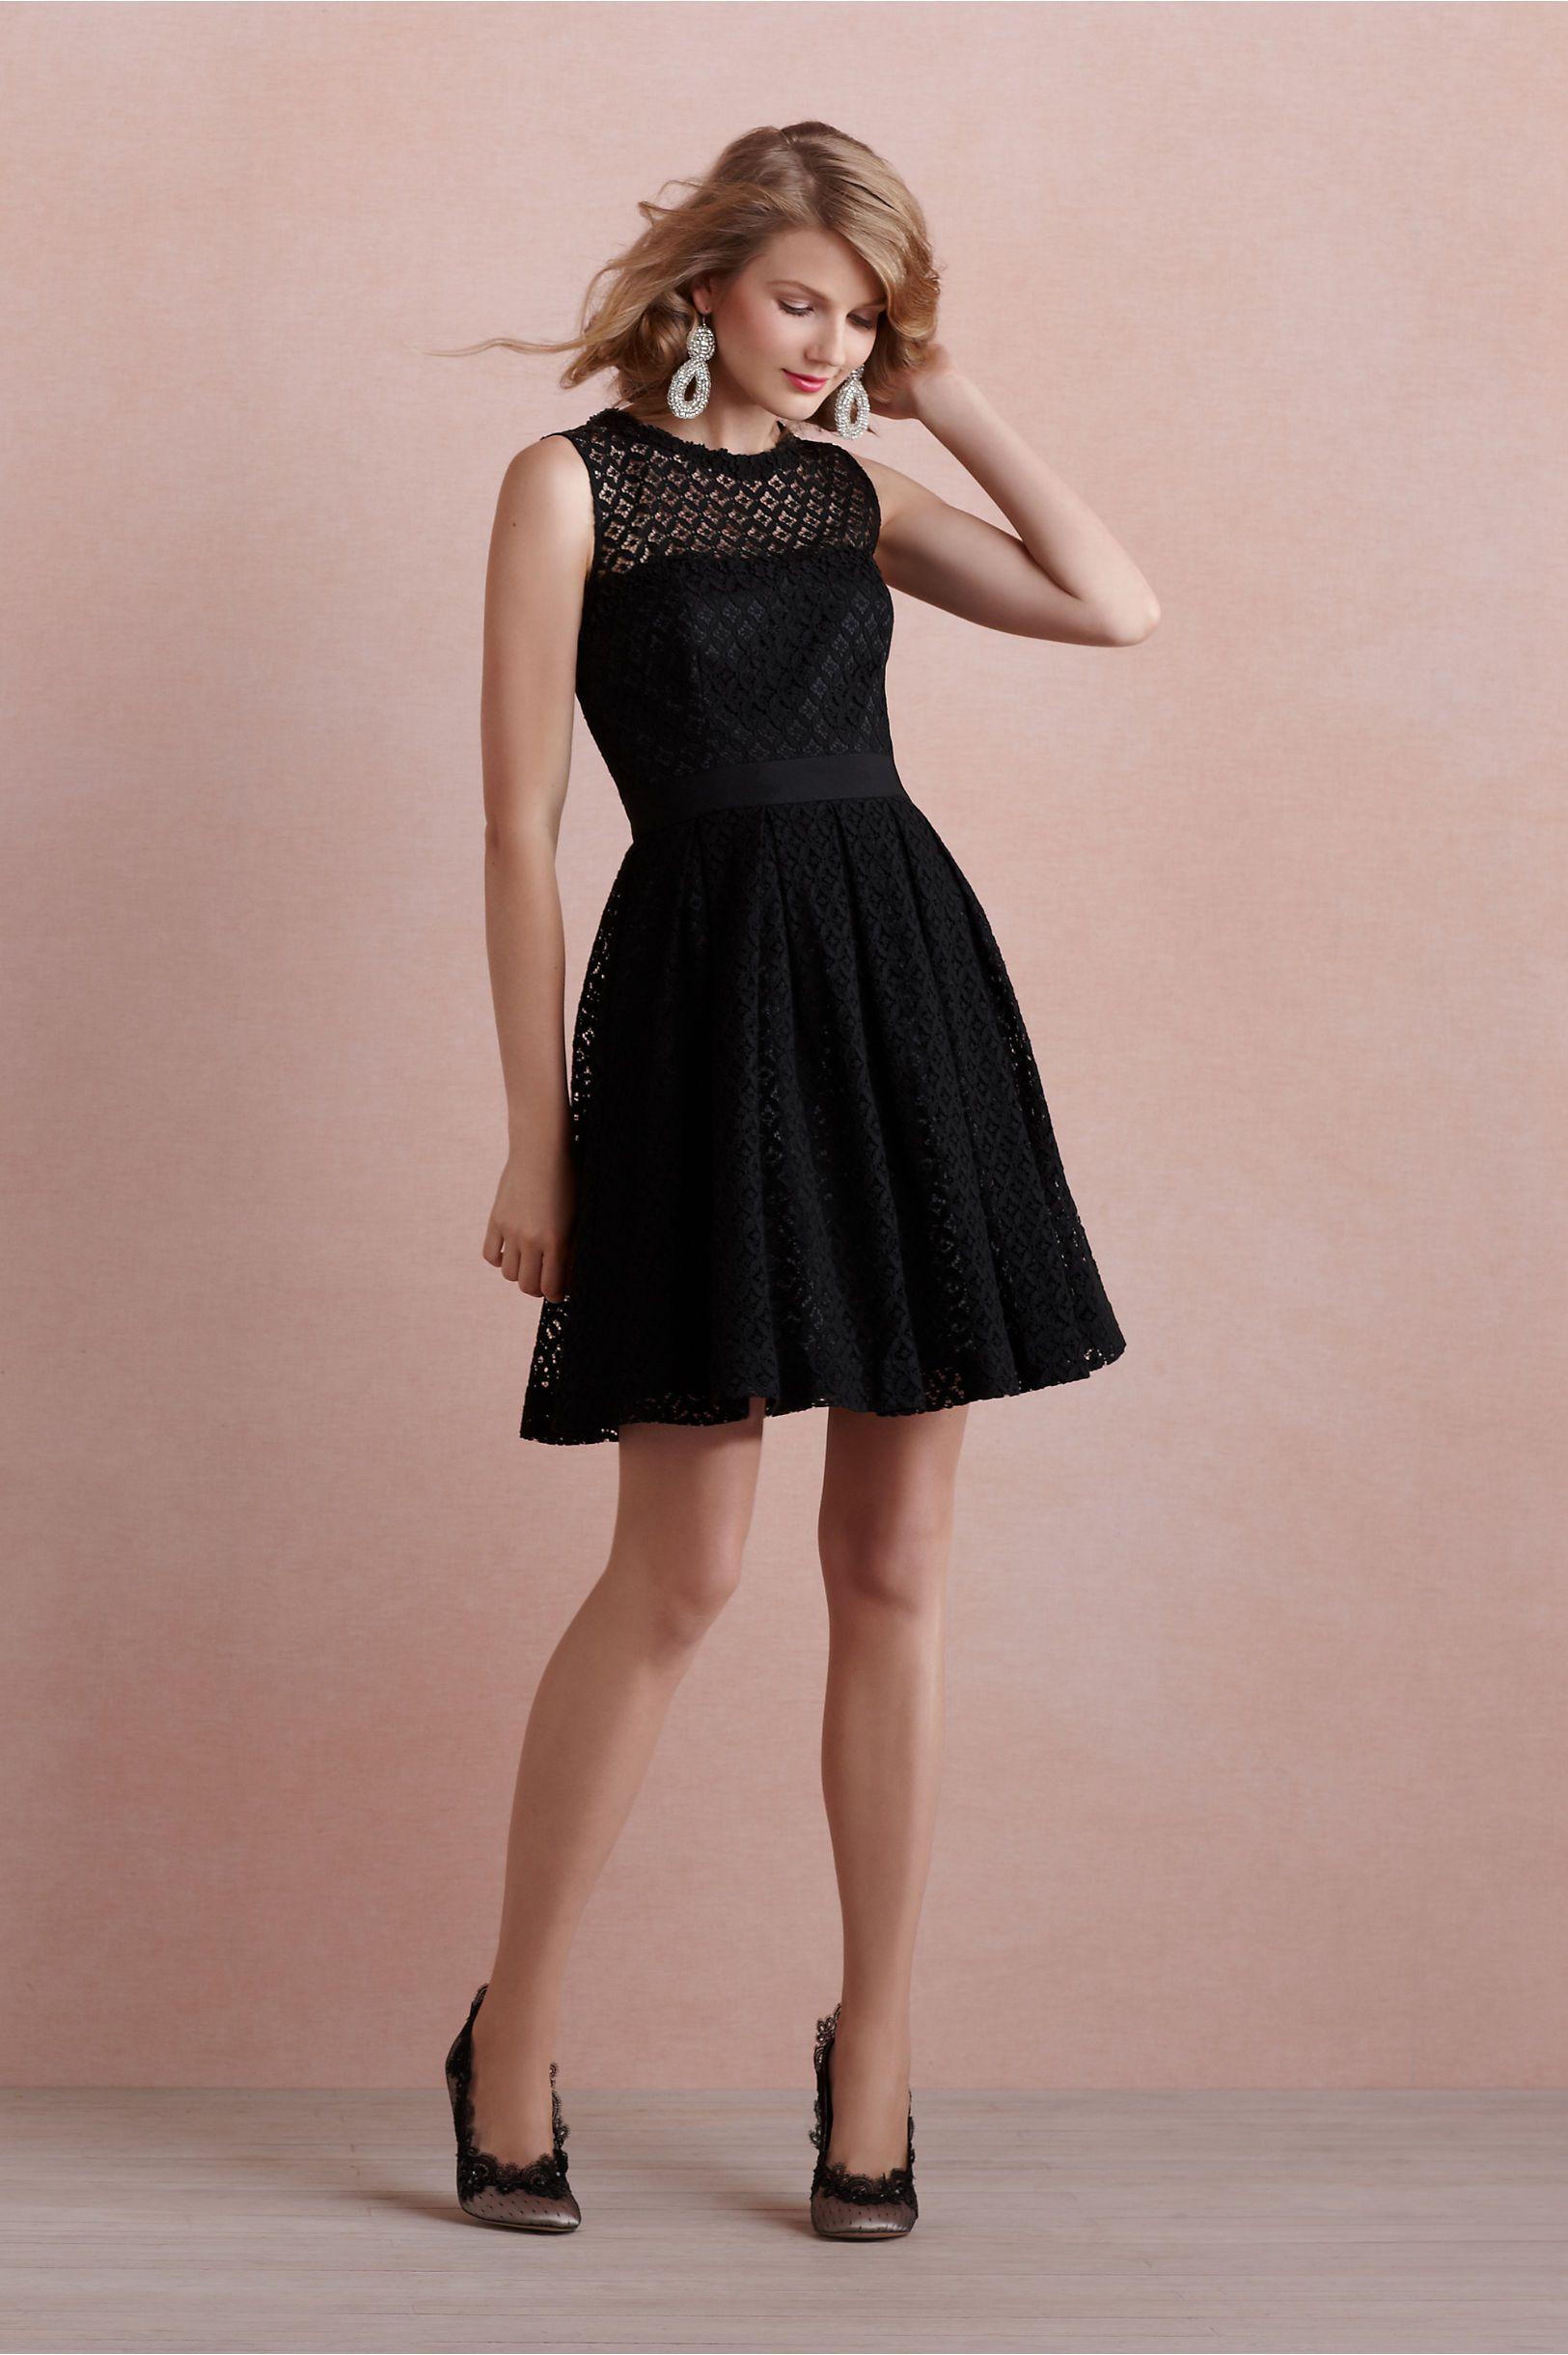 Pin de Belén Kundt en Dresses | Pinterest